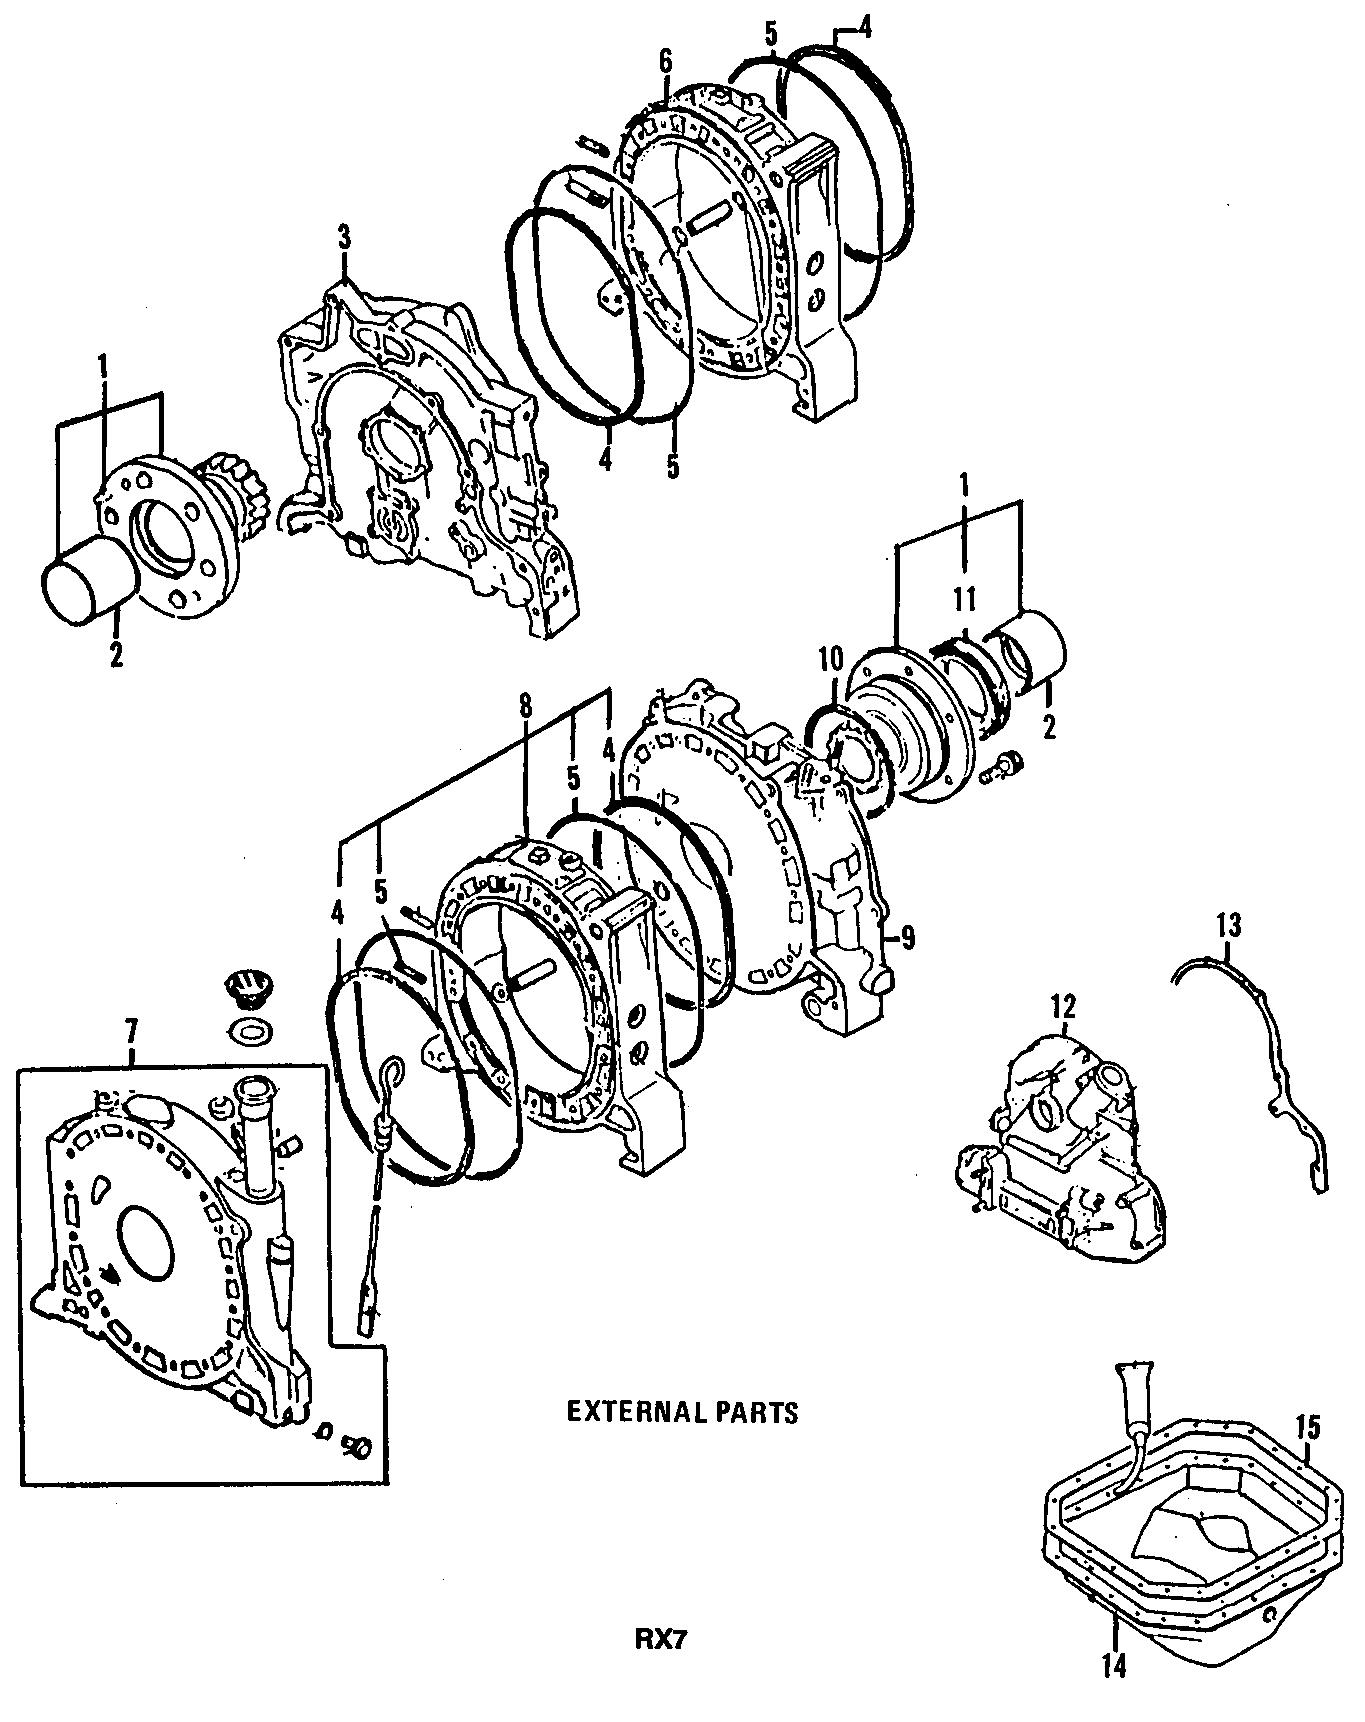 Mazda RX-7 Rotor Housing. (Front). RX-7; w/o Turbo. W/Fuel